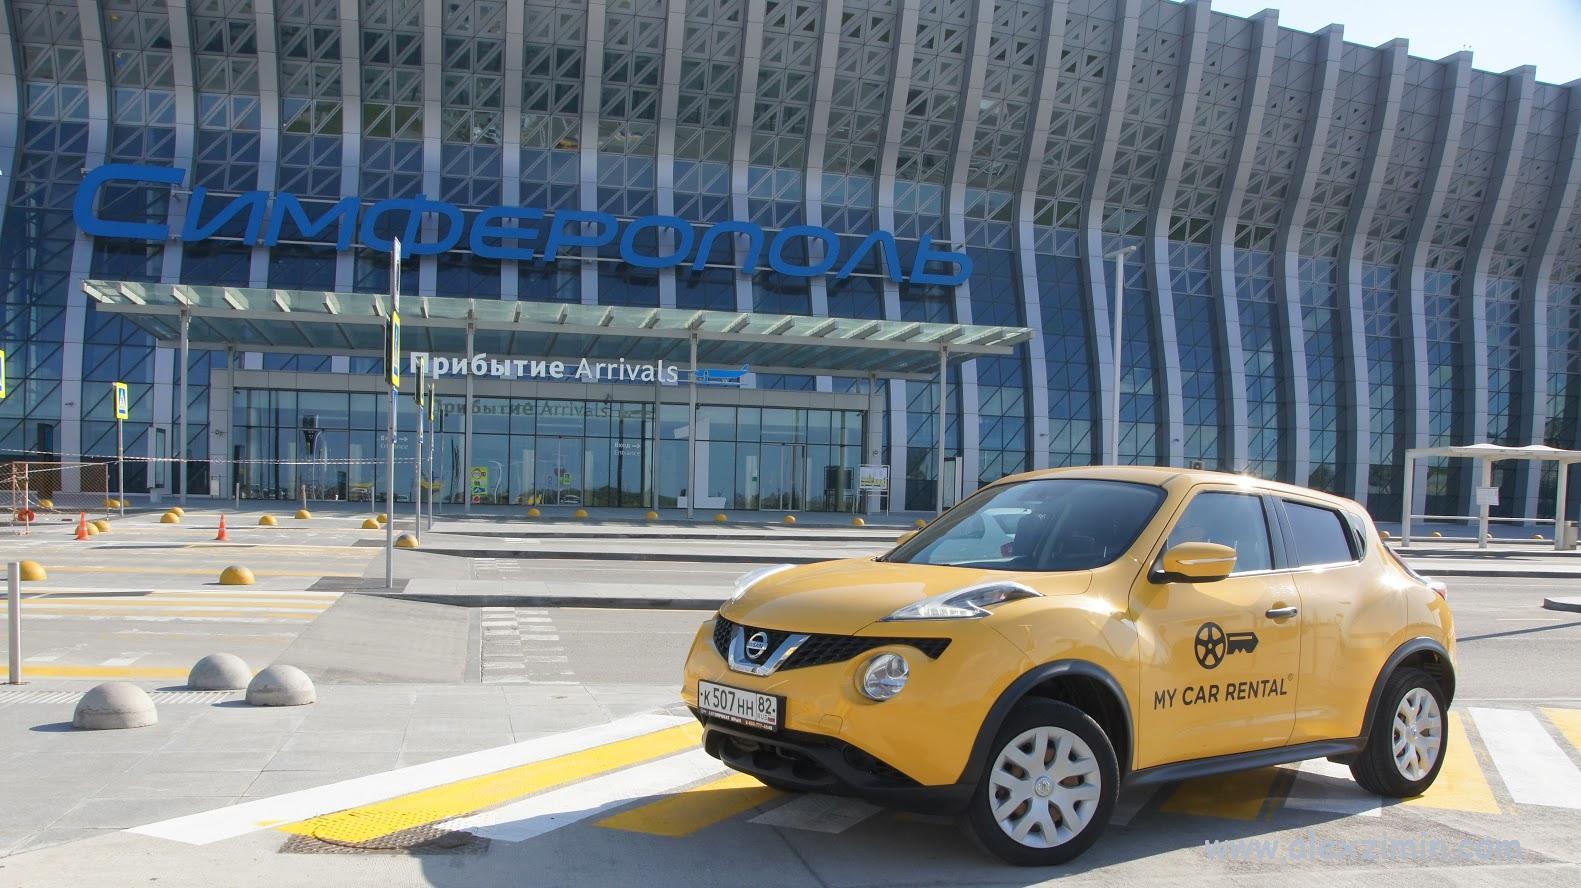 Автопрокат МайкарРентал в аэропорту Симферополя в мае 2020